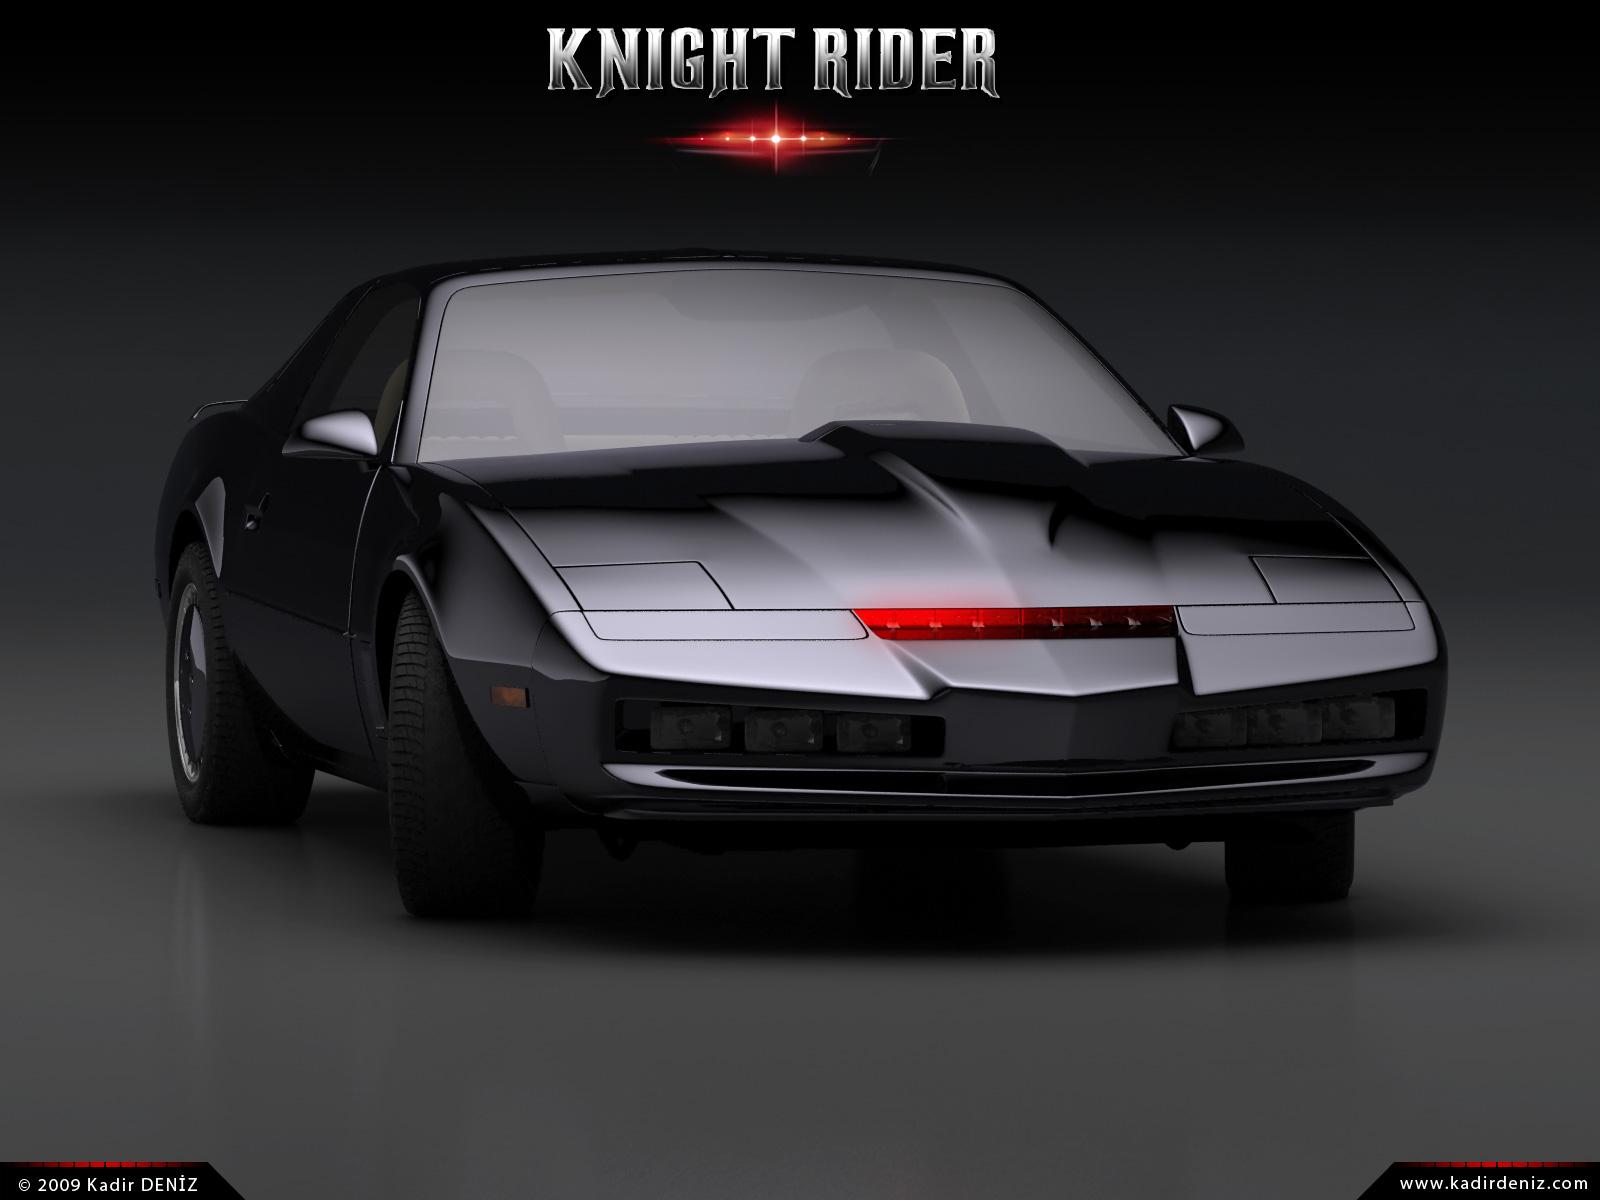 knight rider car wallpaper wallpapersafari. Black Bedroom Furniture Sets. Home Design Ideas